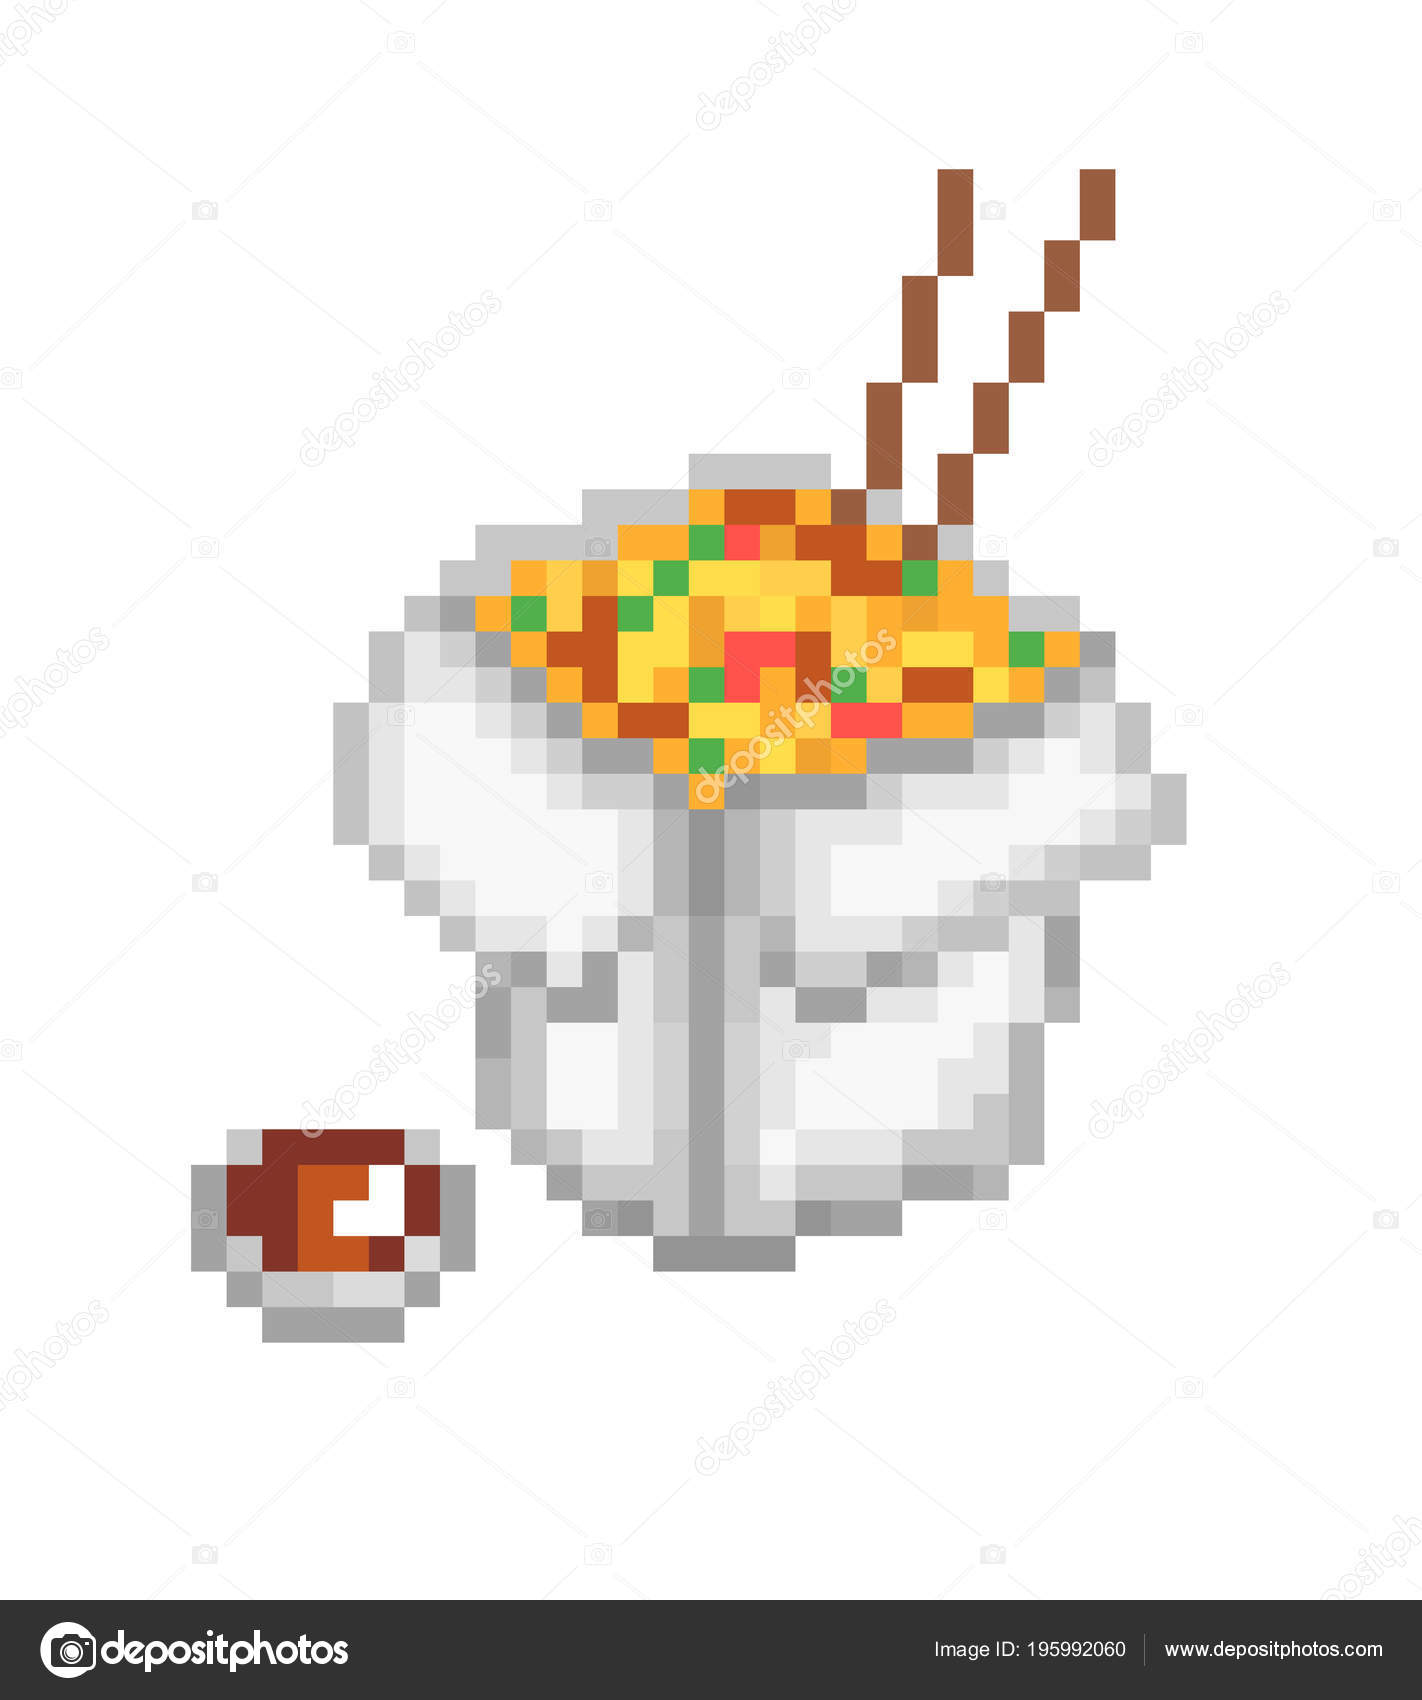 Chinese Food Box Pixel Art Icon Isolated White Background Noodles Stock Vector C Ksuperksu 195992060